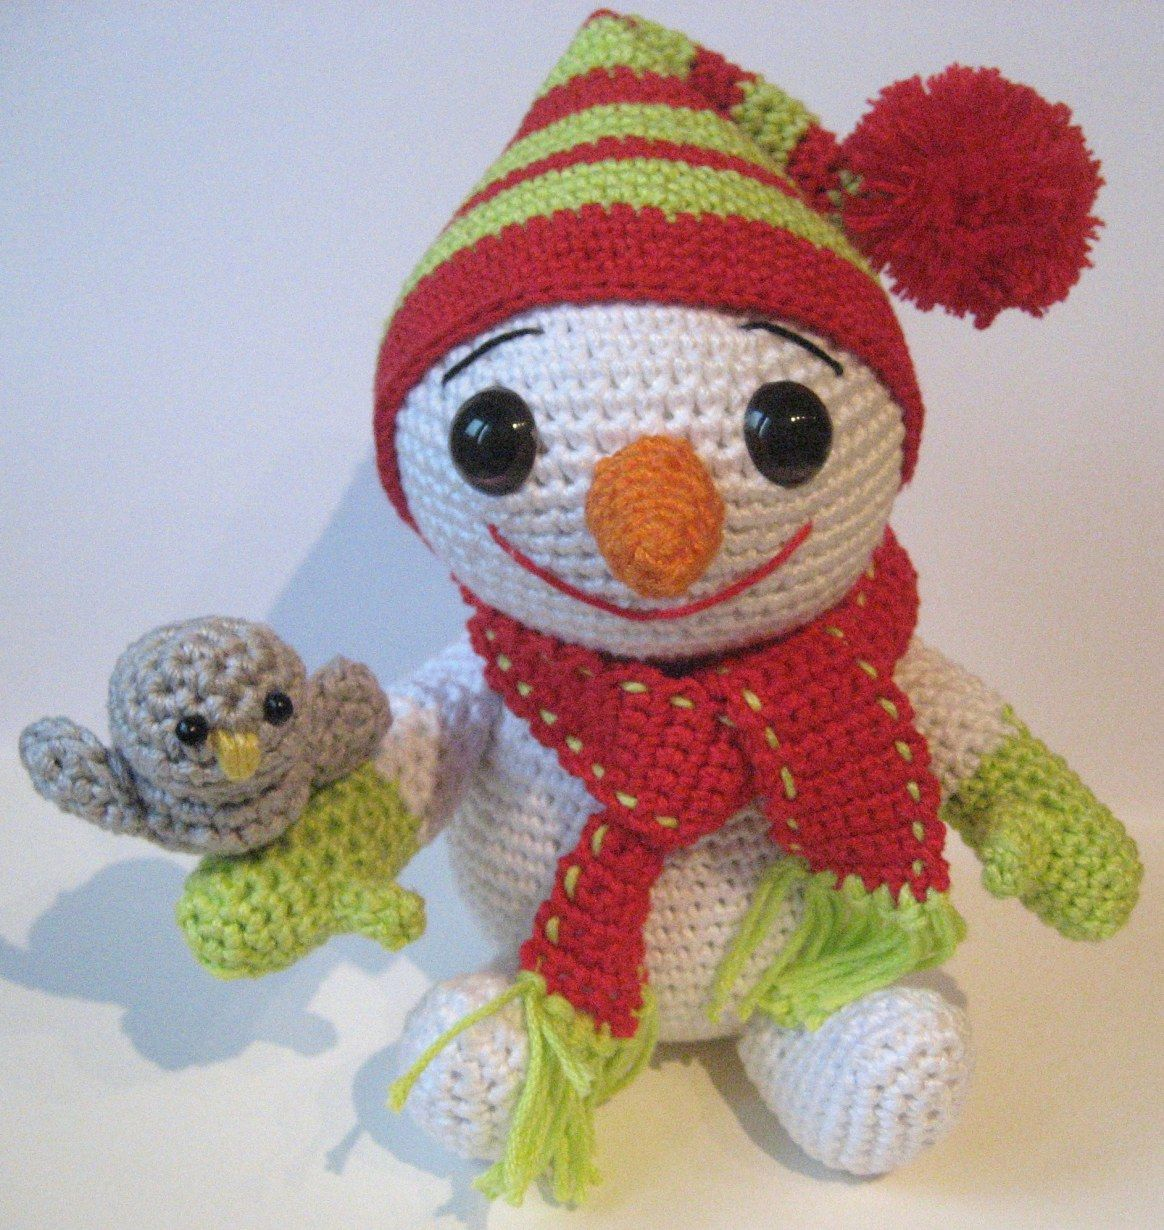 Schneemann snowman häkeln crochet | Häkeln Weihnachten | Pinterest ...